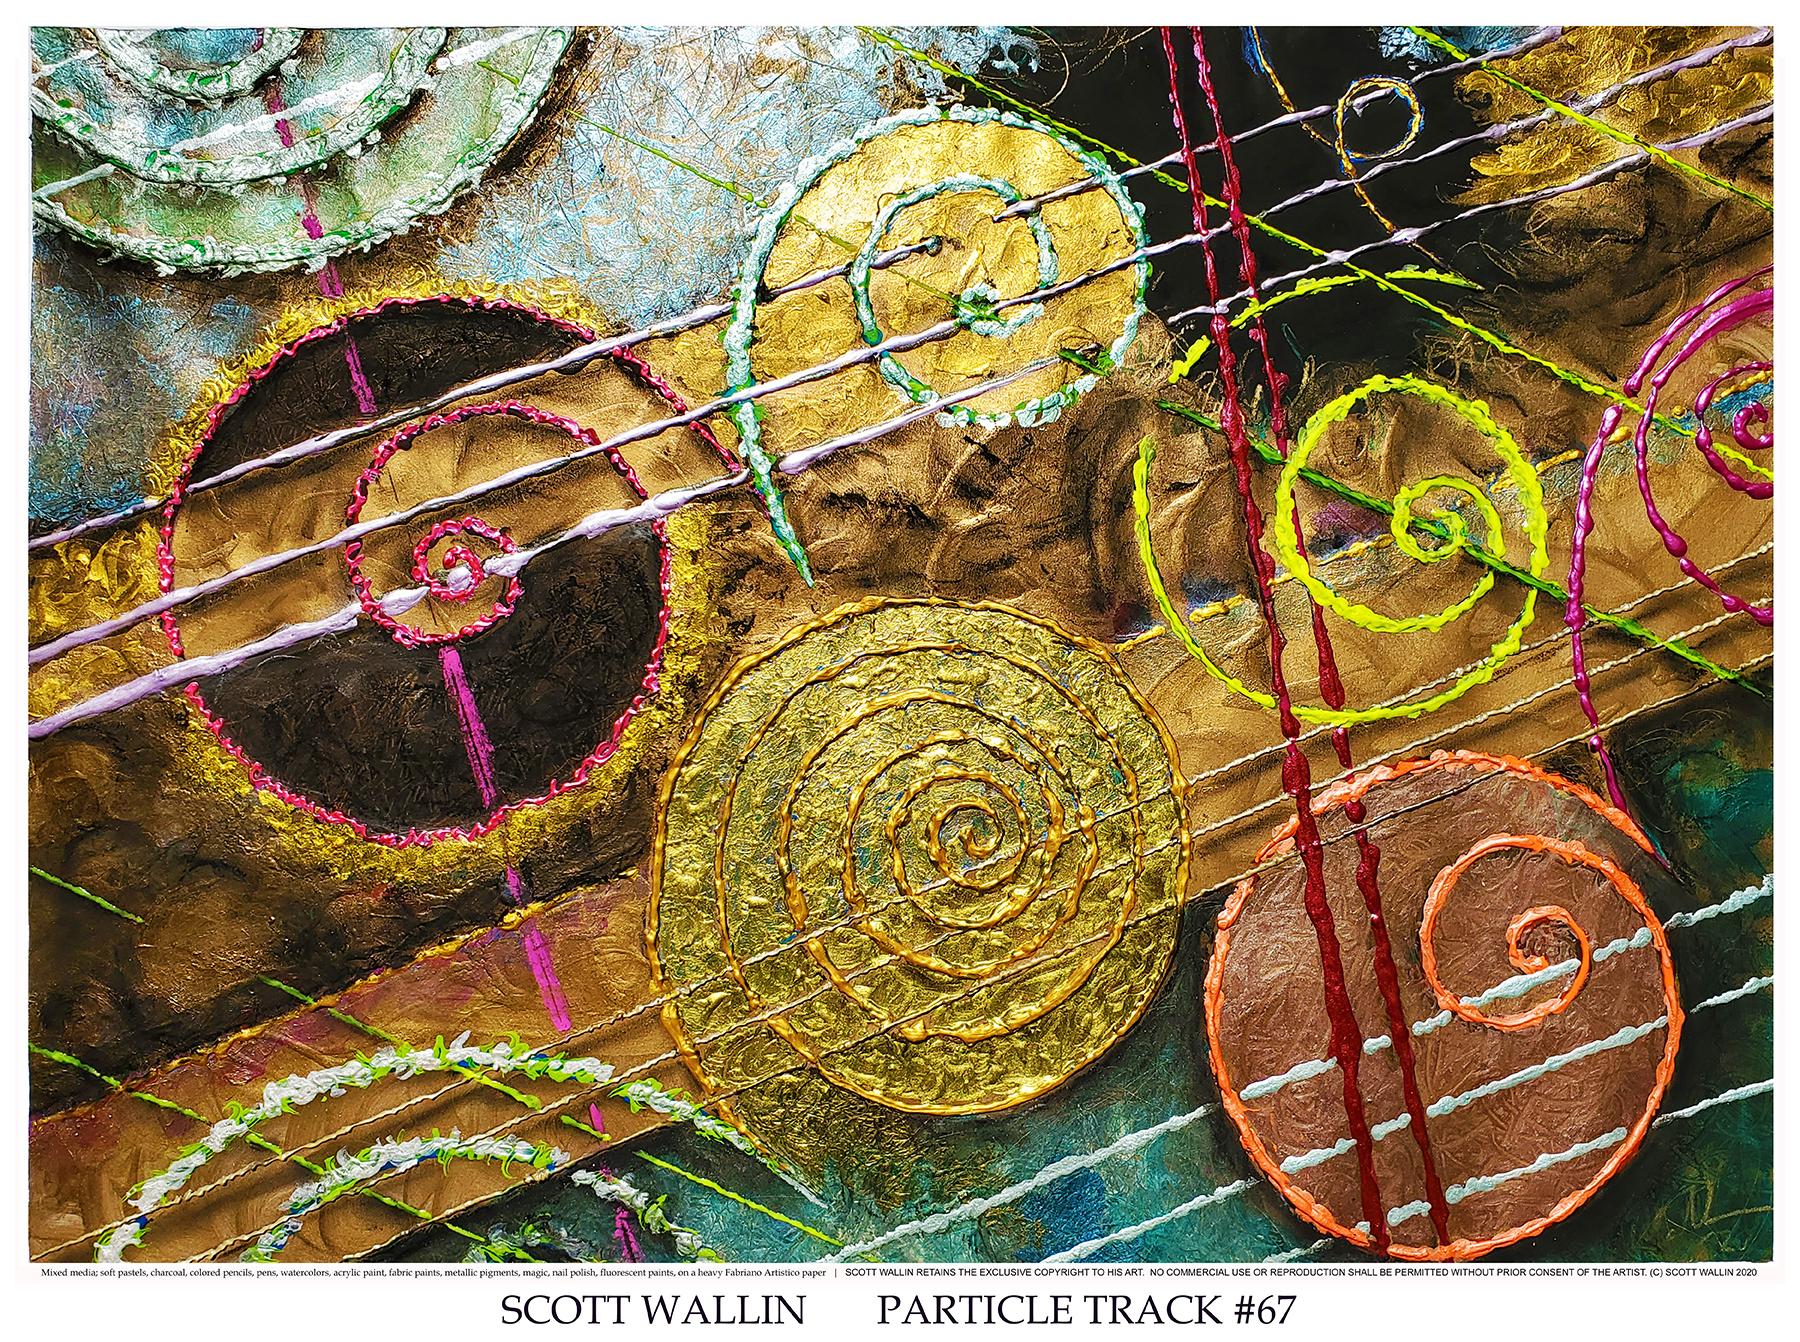 PARTICLE TRACK #67 (c) 2020 SCOTT WALLIN